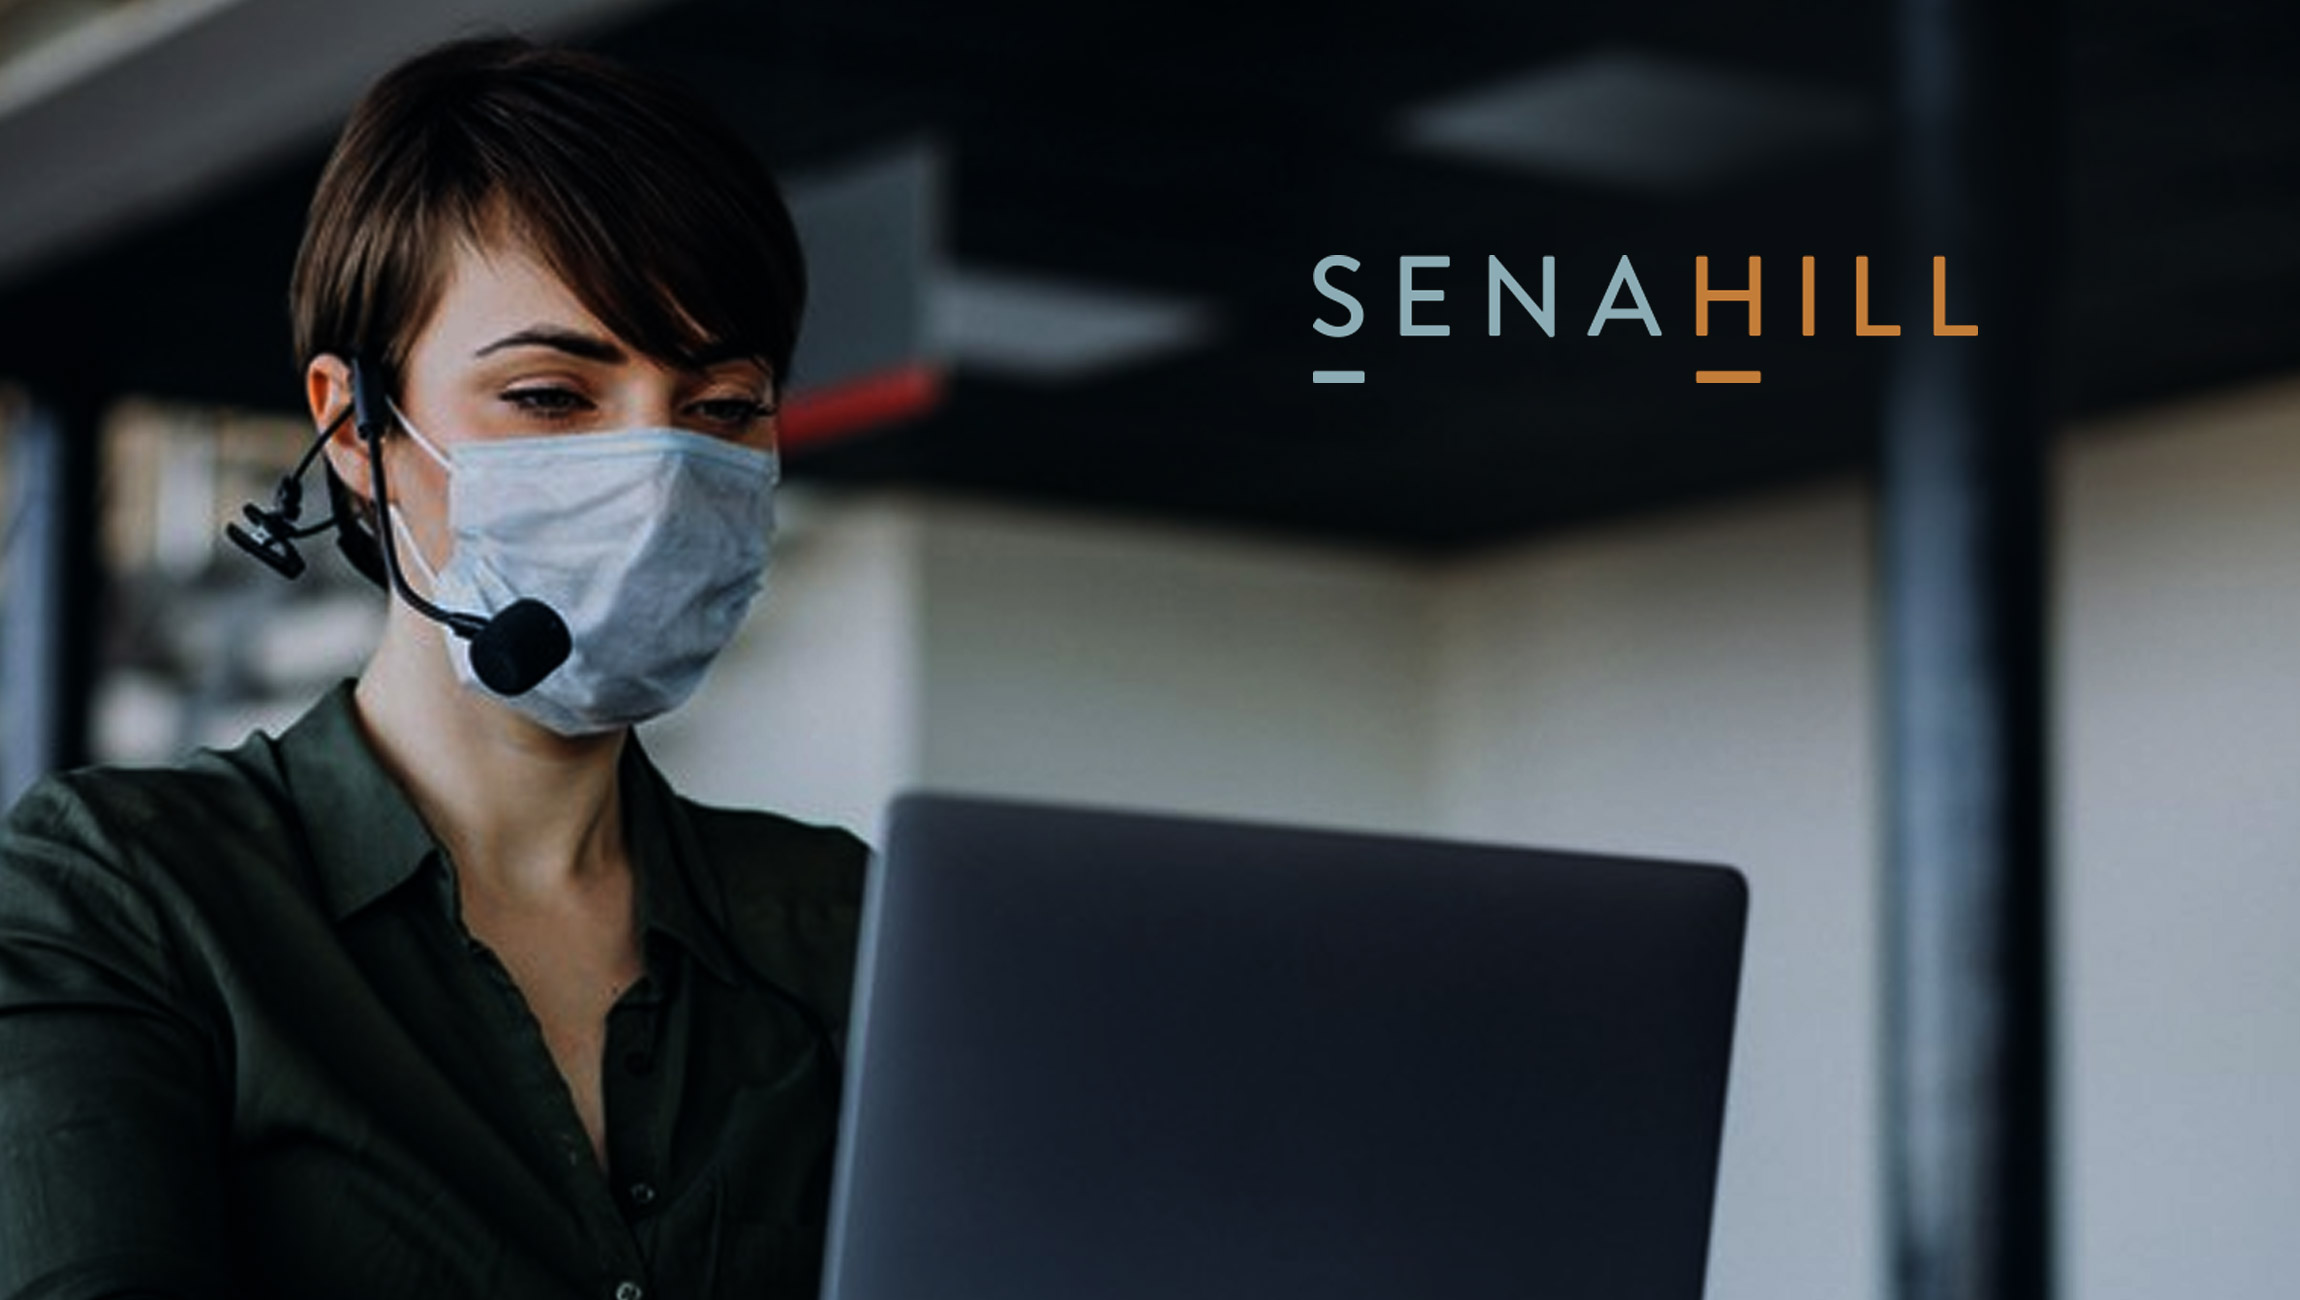 SenaHill Partners Embraces LeapXpert's FMOP Messaging Applications For Front-Office Client Communications